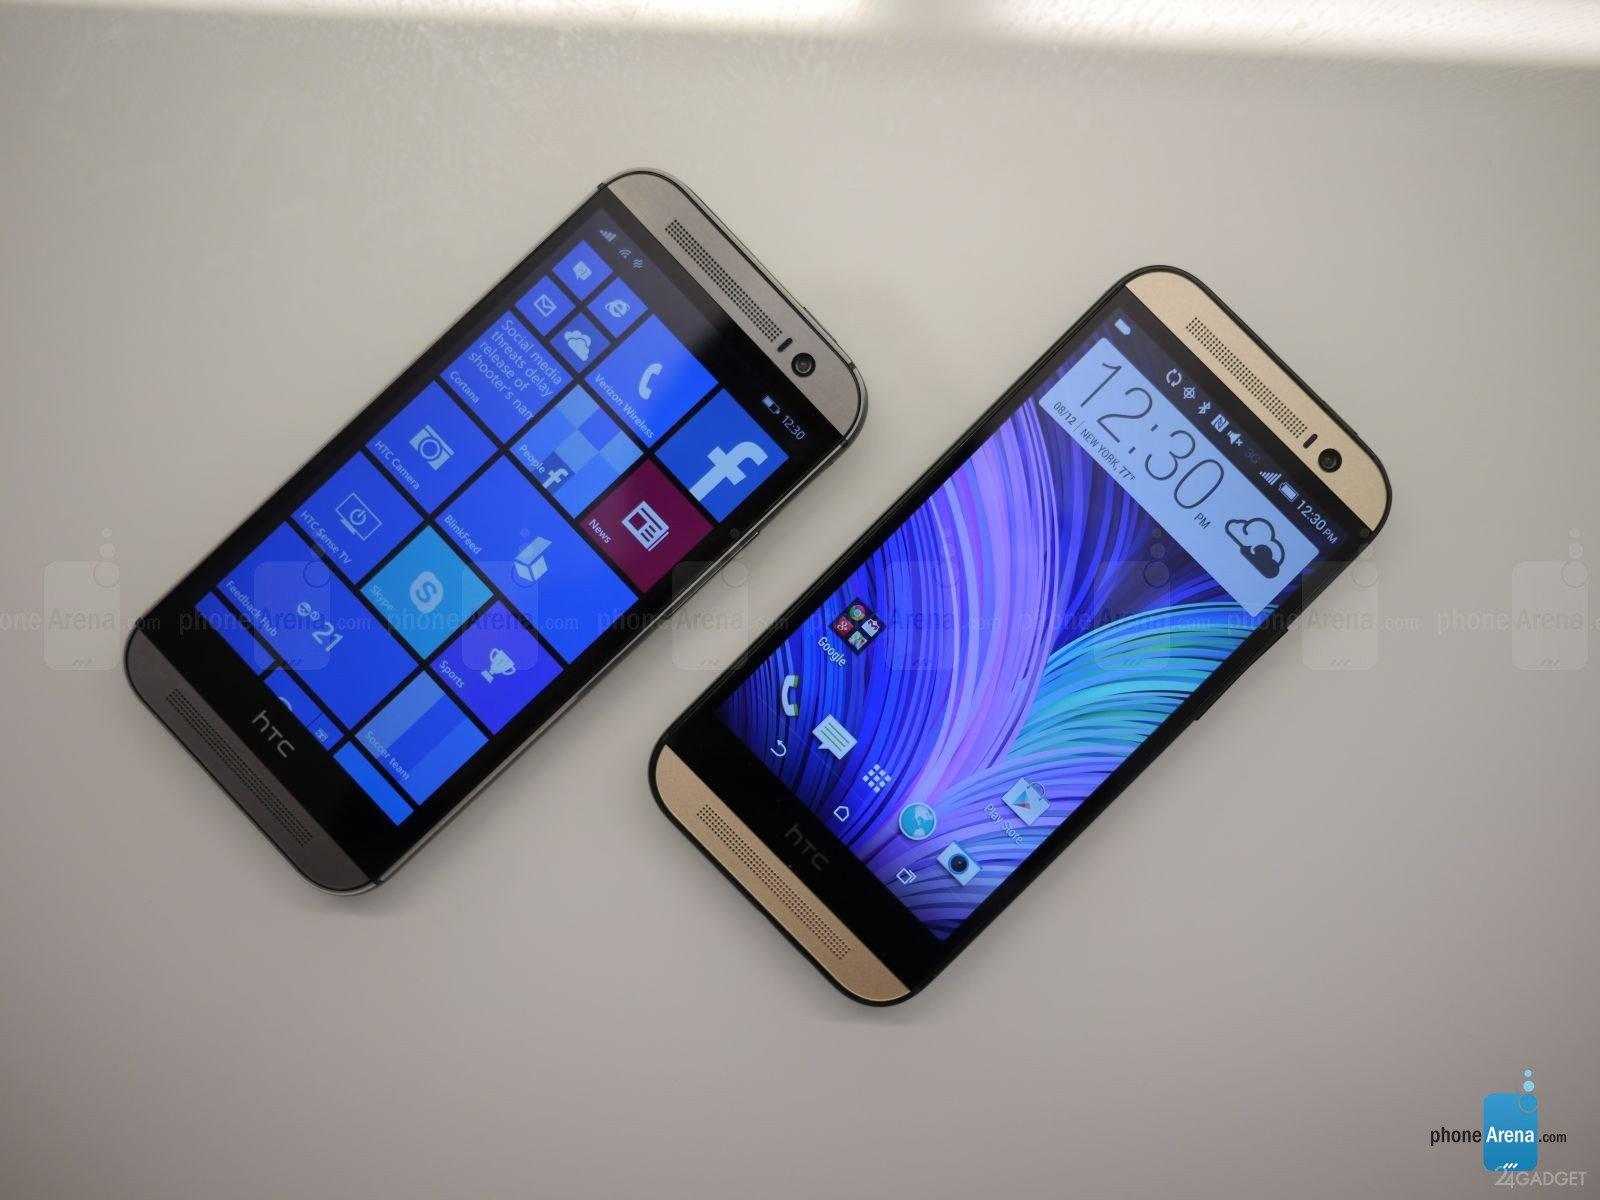 Сравнение между Windows Phone и Android - …